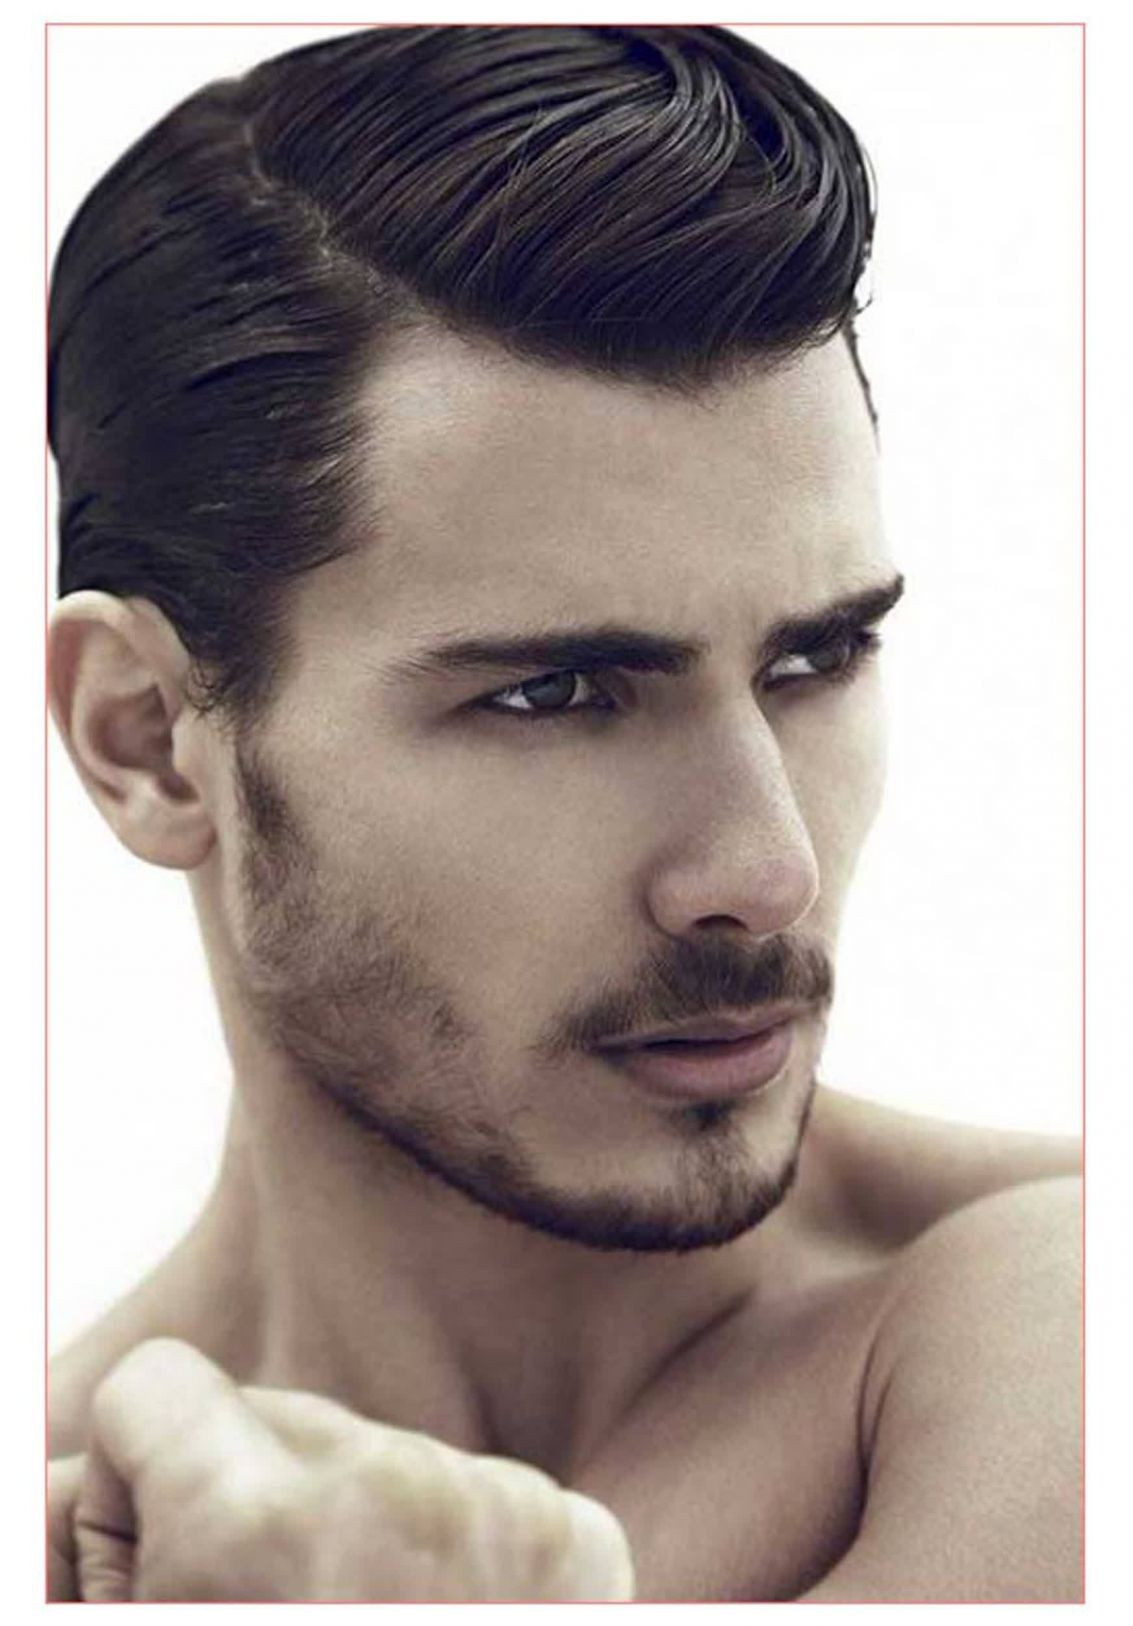 Hohe Stirn Frisur Mann 2021 In 2020 Frisuren Haarschnitte Styling Kurzes Haar Fade Haarschnitte Fur Herren